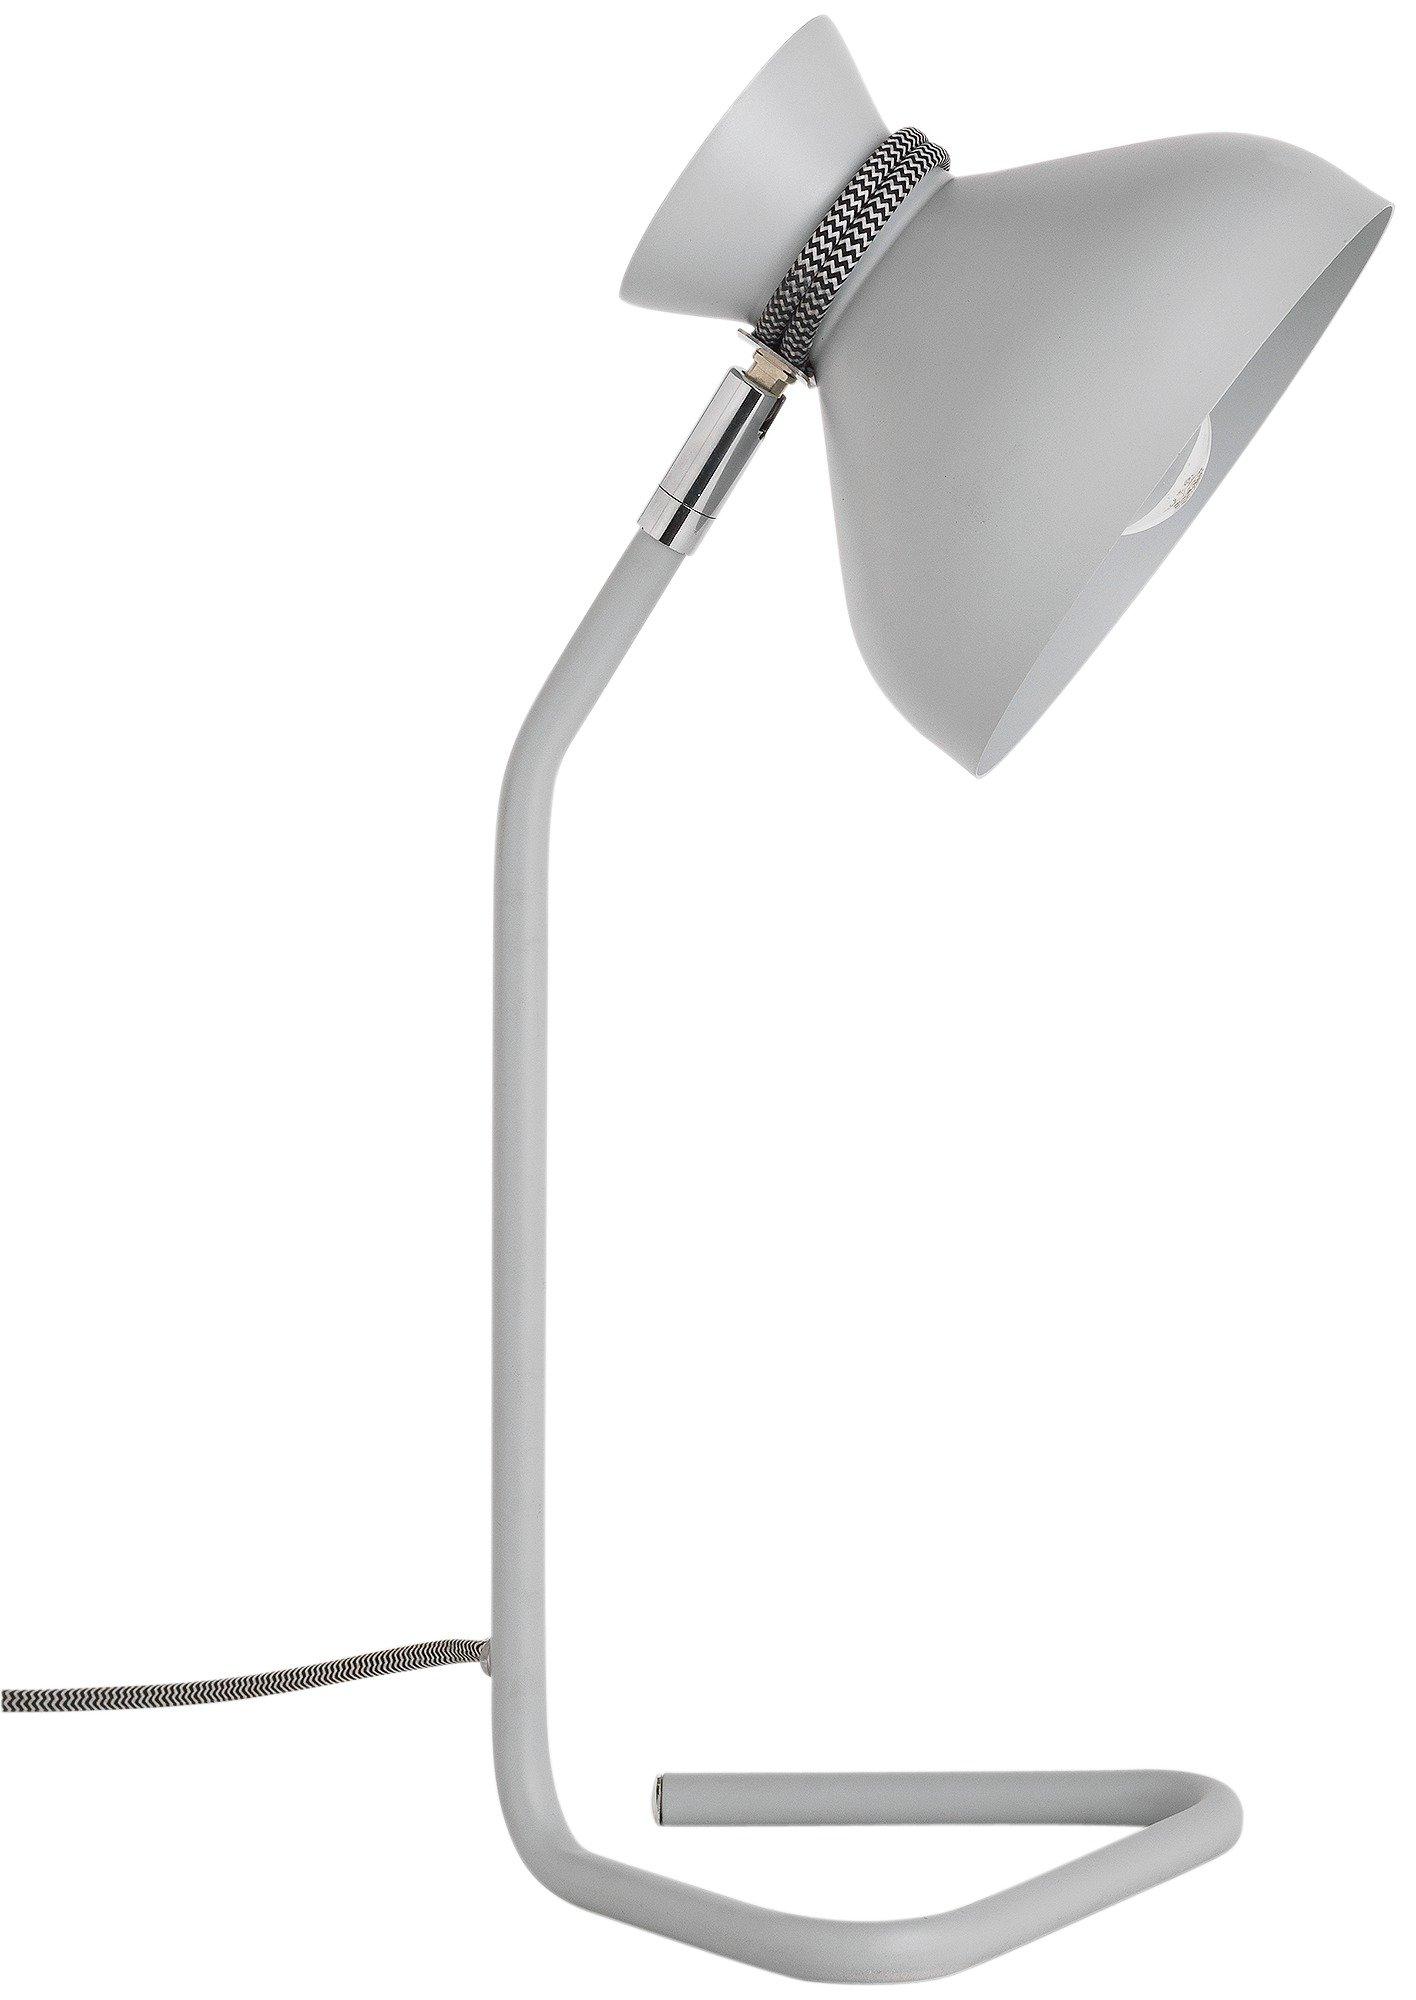 Image of Hygena Pola Table Lamp - Grey